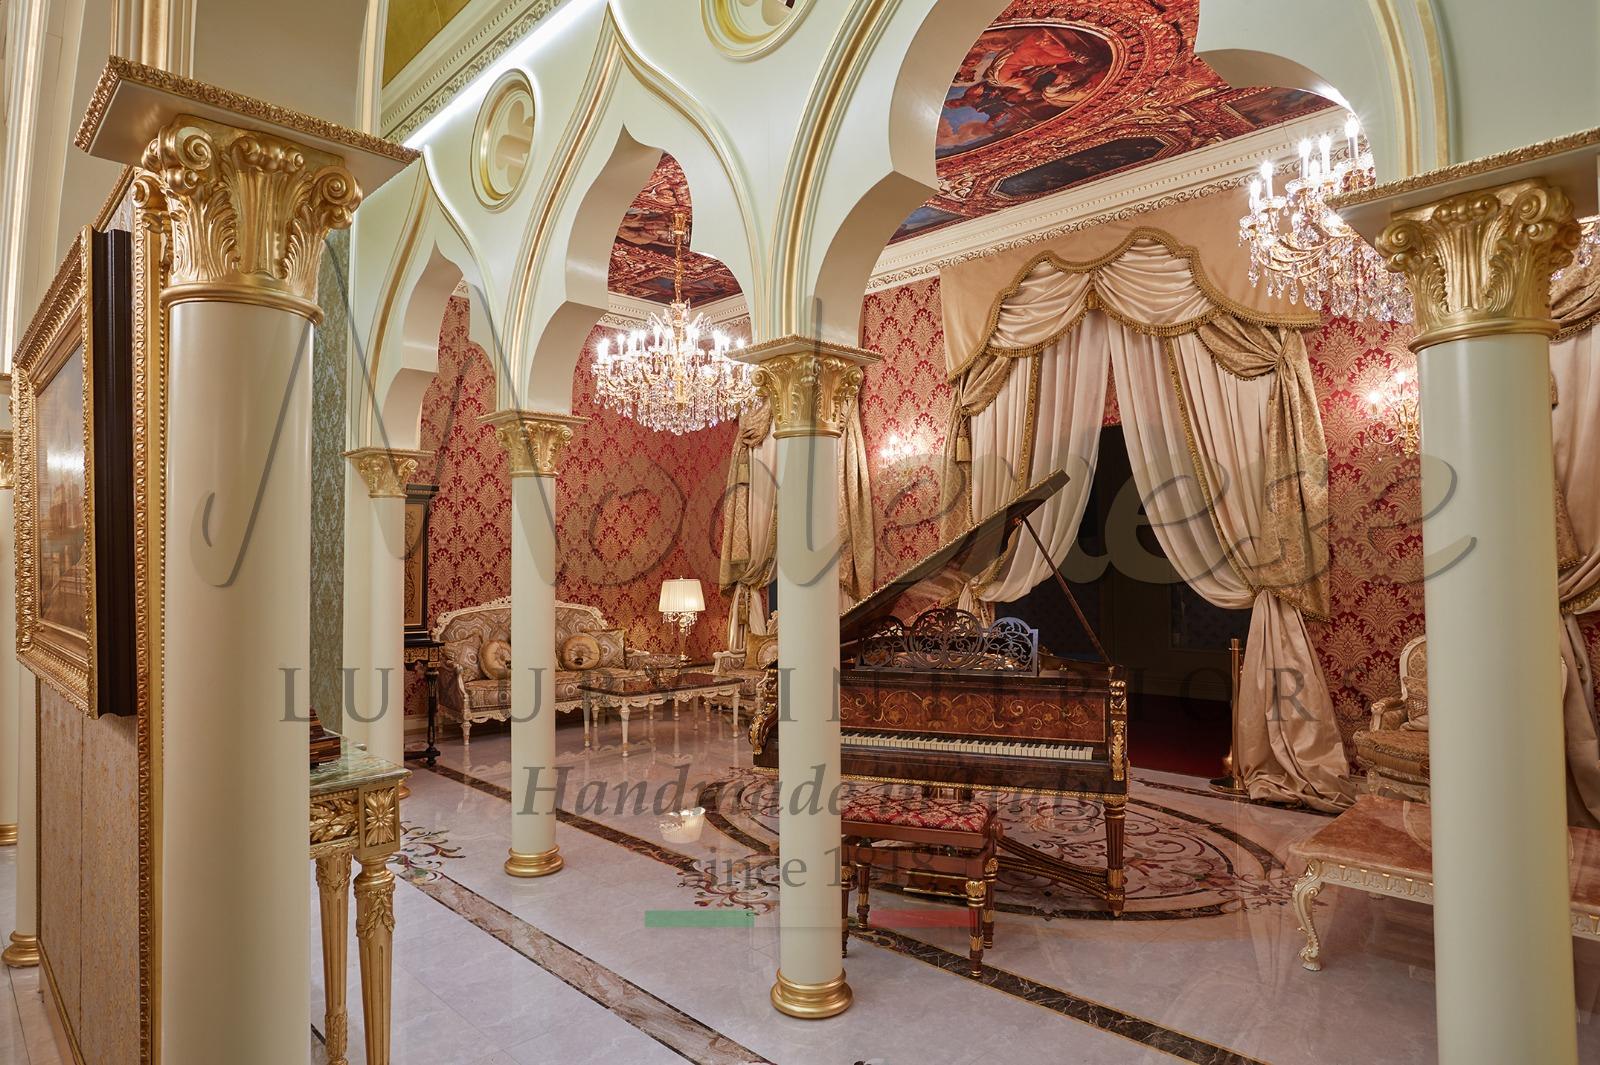 royal piano classic luxury Italian furniture handmade production manufacturing in Italy artisans artisanal skills craftsmanship salone del mobile design week